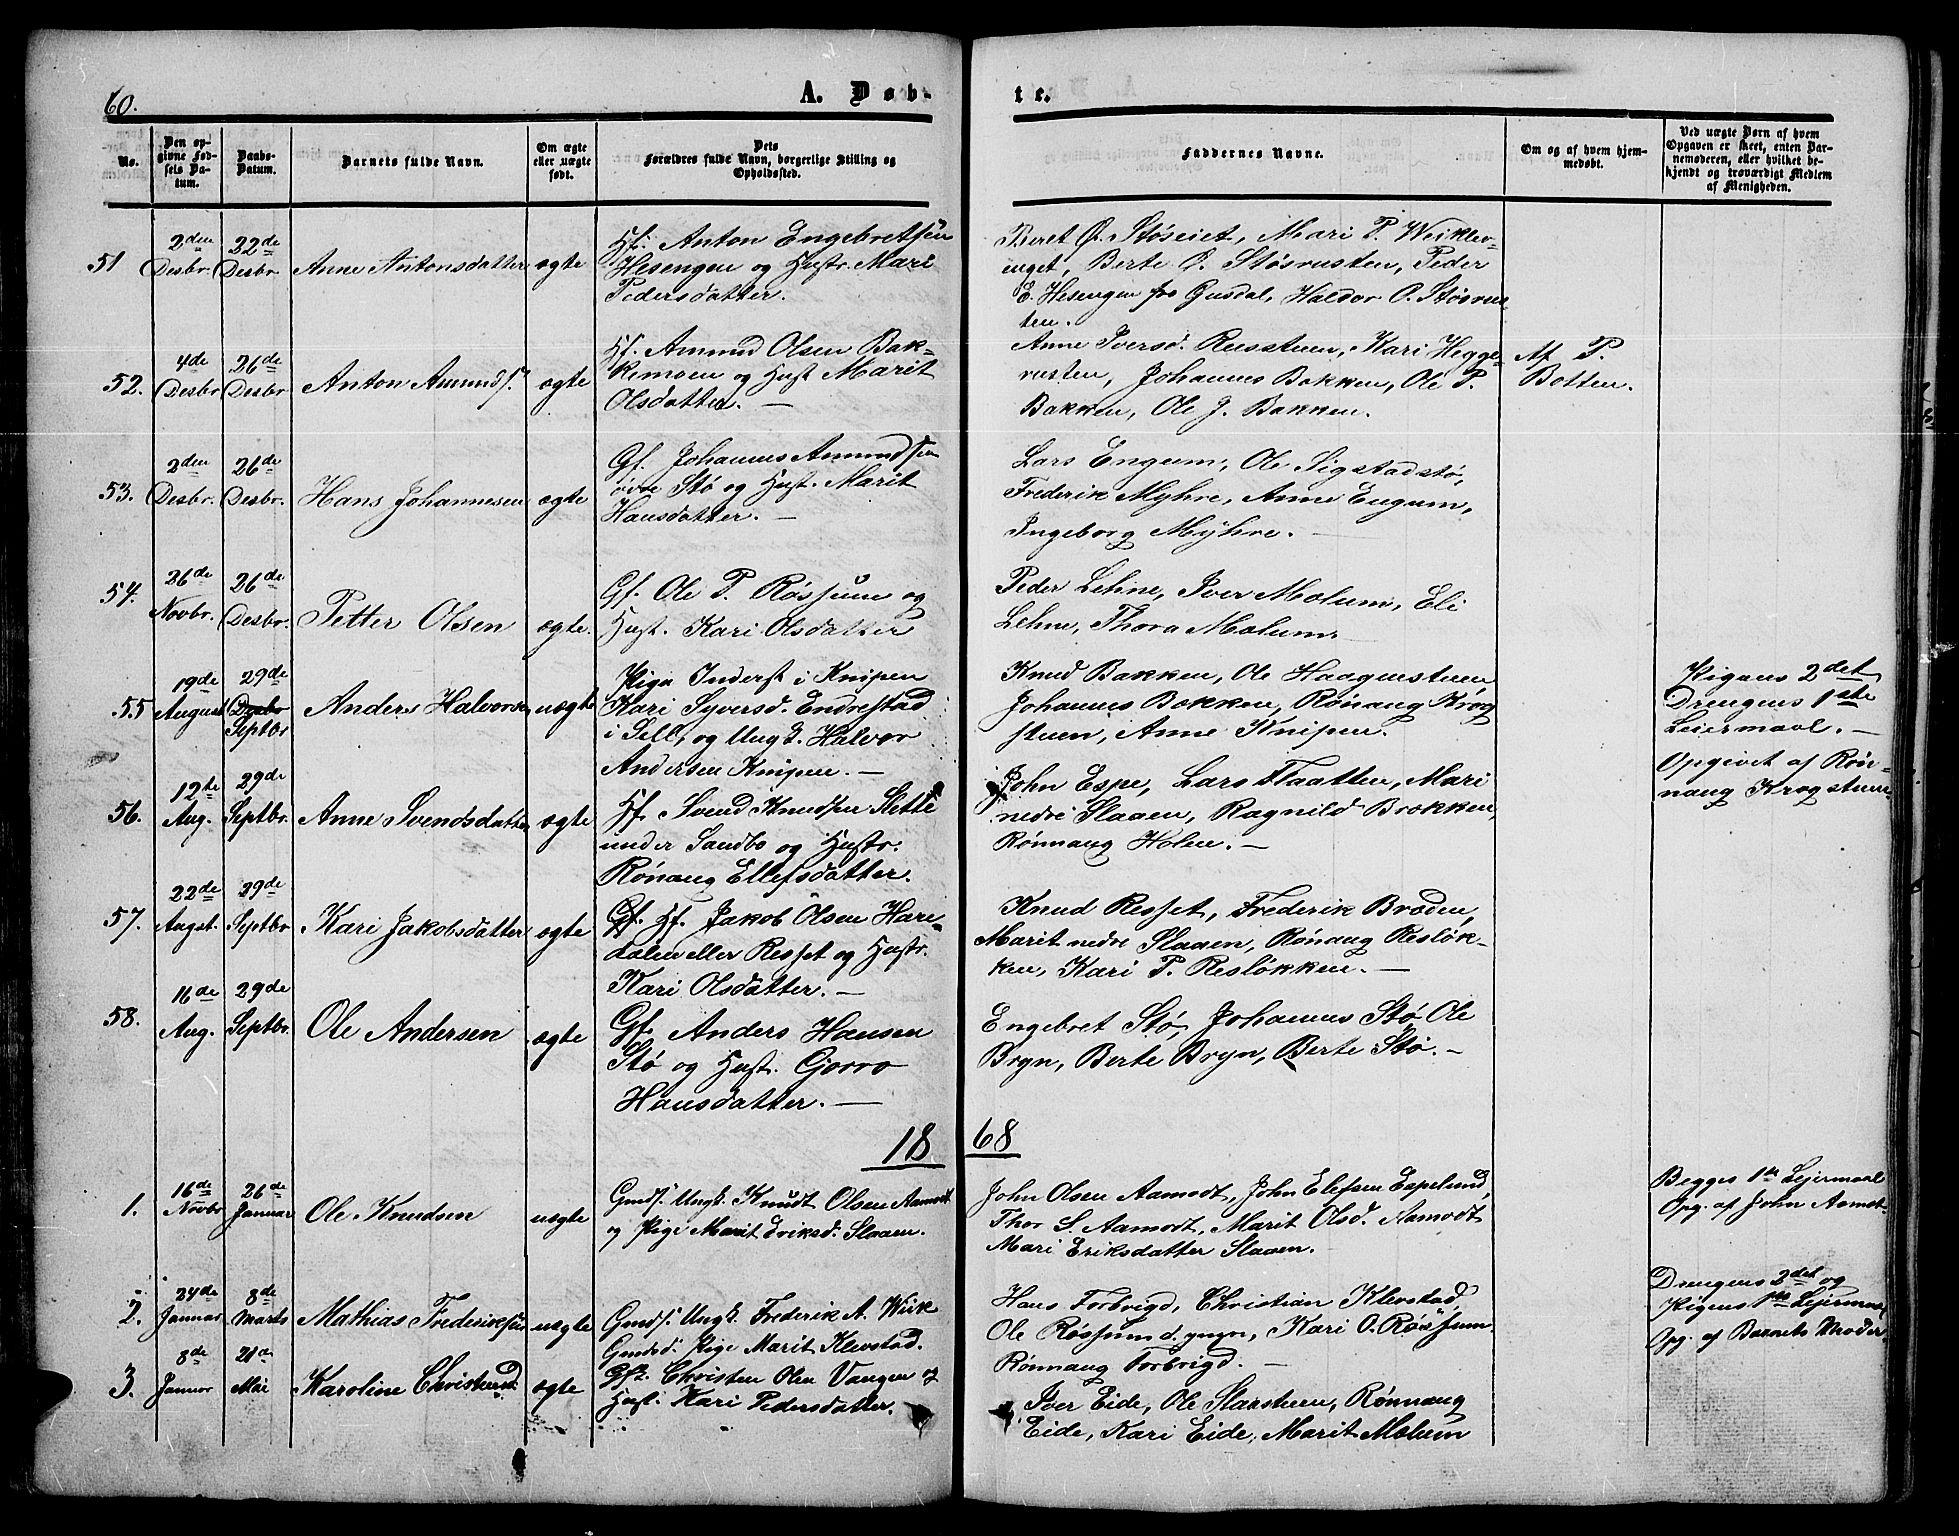 SAH, Nord-Fron prestekontor, Klokkerbok nr. 3, 1851-1886, s. 60